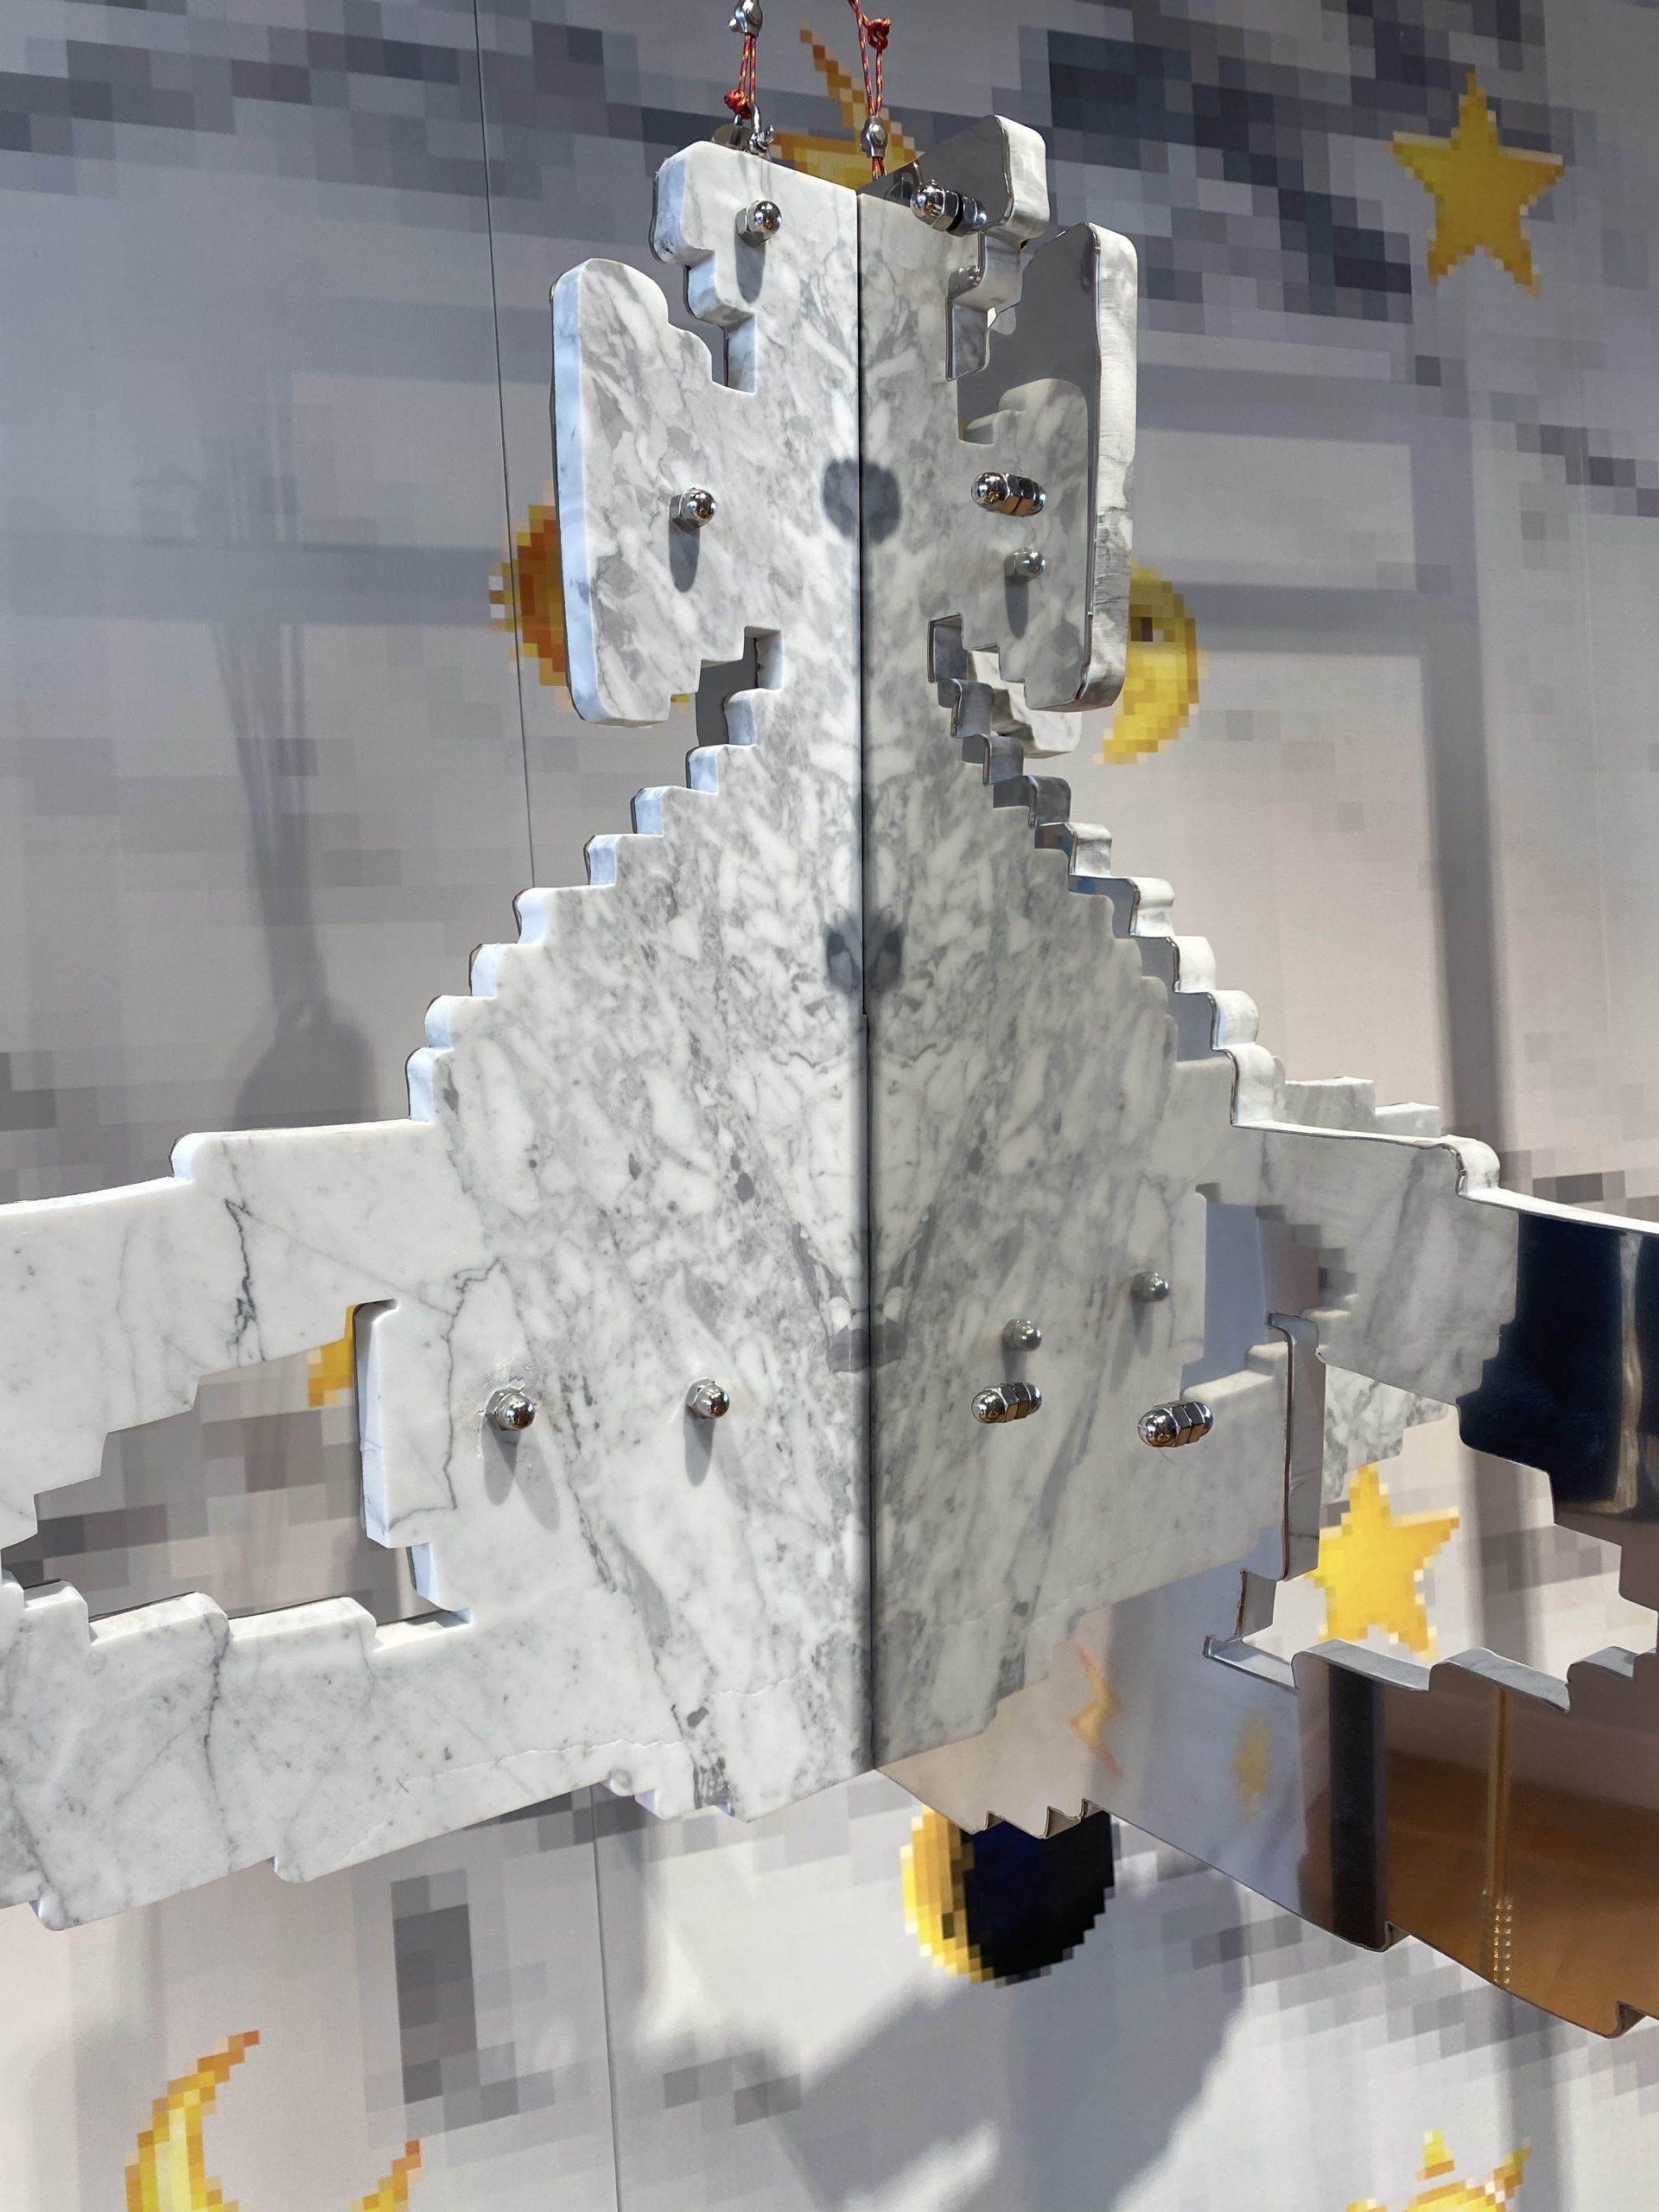 ORBITAL, 2021 installation view, @ Vivienne Westwood boutique Milano Michele Chiossi marmo marble sculpture scultura orb fashion week design contemporary art wallpaper mobile emoji stars sun moon Creativespace zigzag mc zigzag pixel